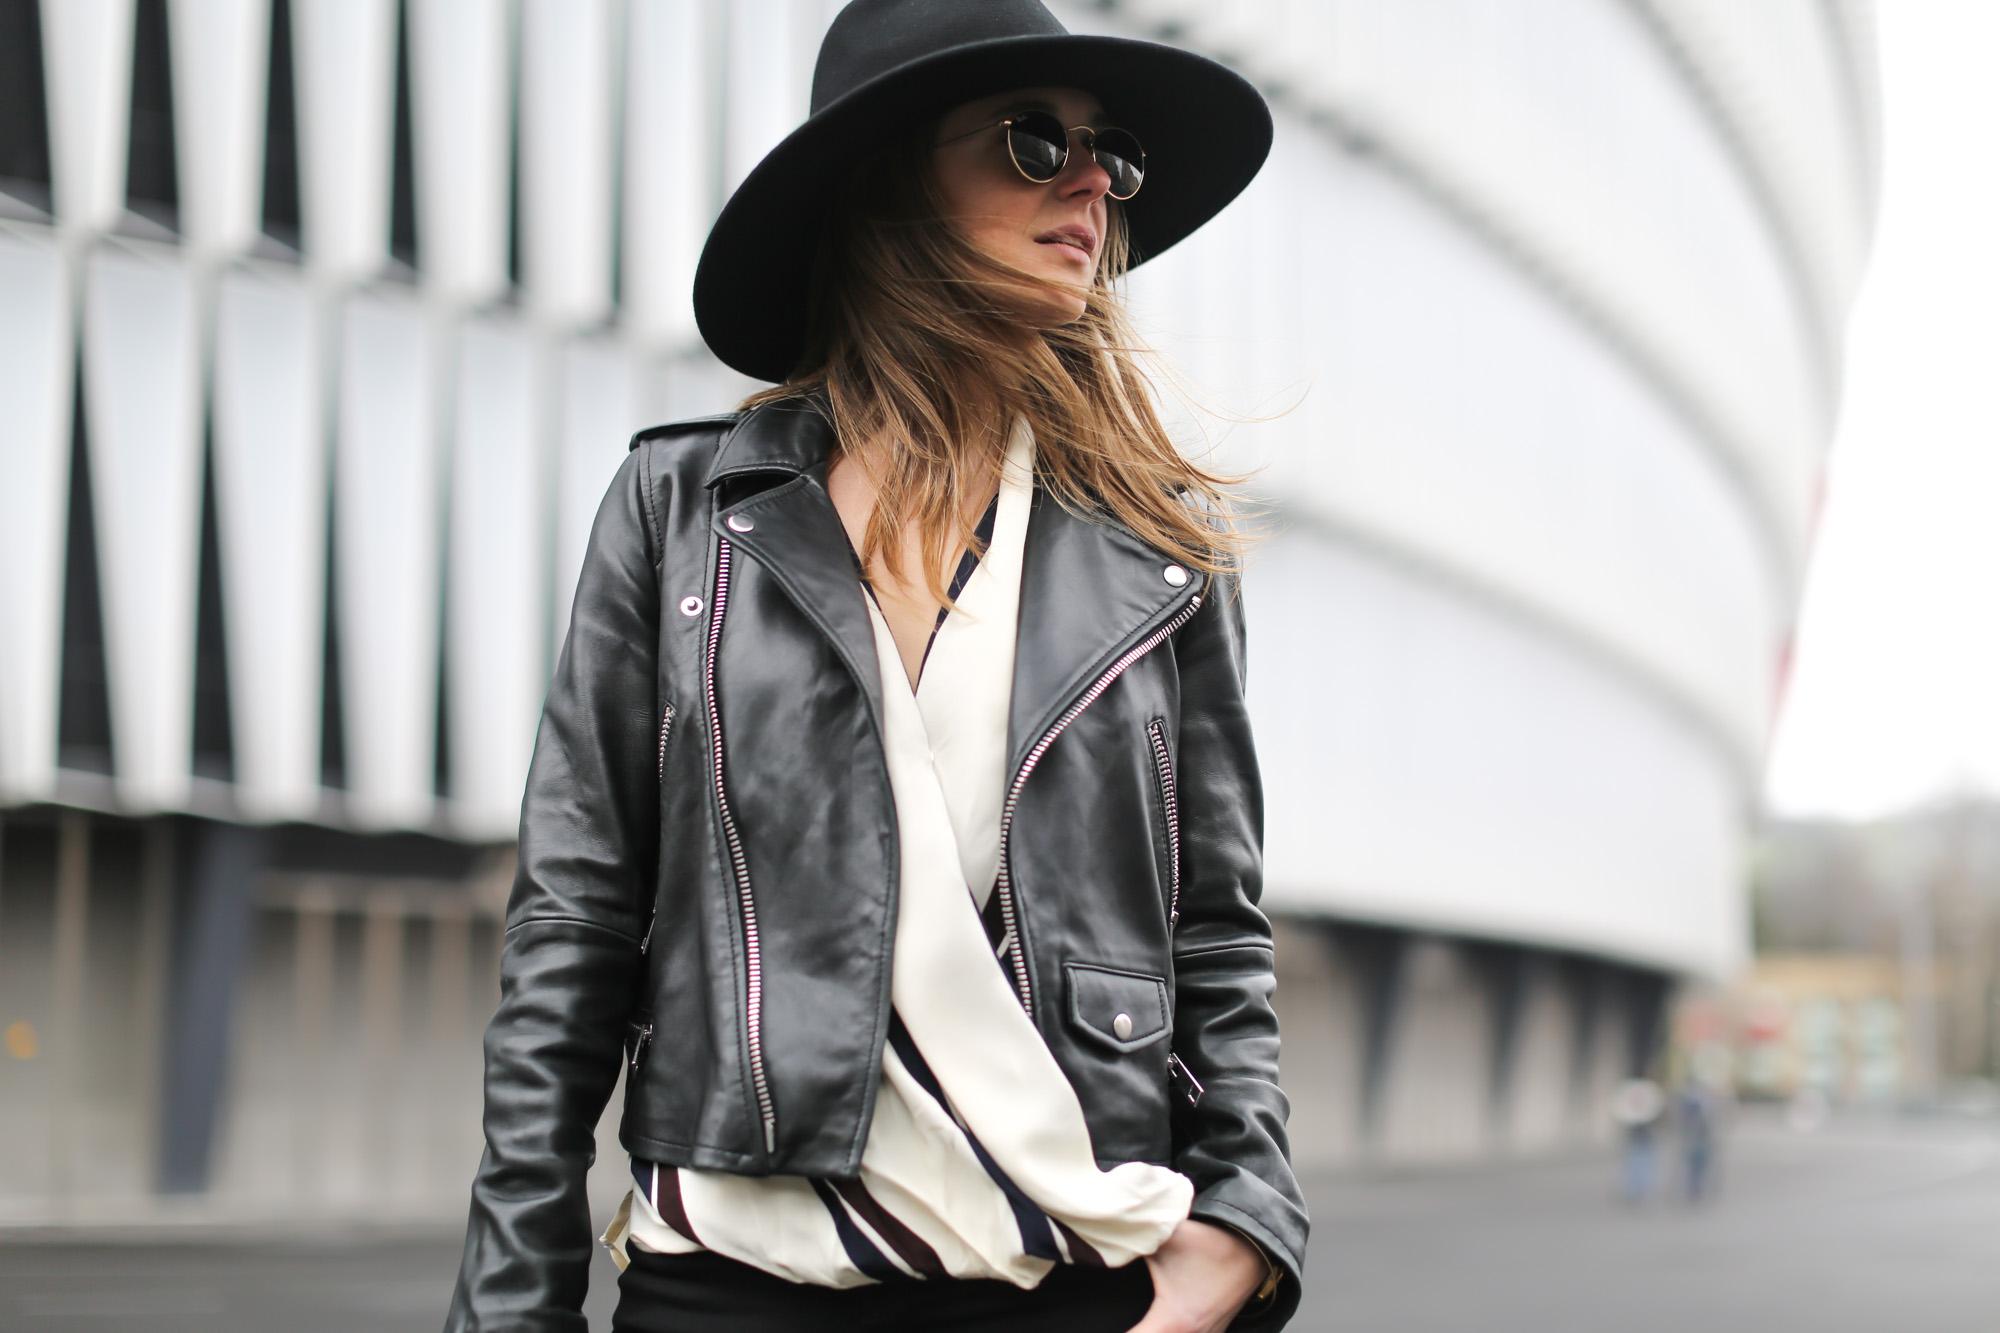 Clochet-streetstyle-topshop-shirt-fedora-hat-mango-leather-biker-jacket-8